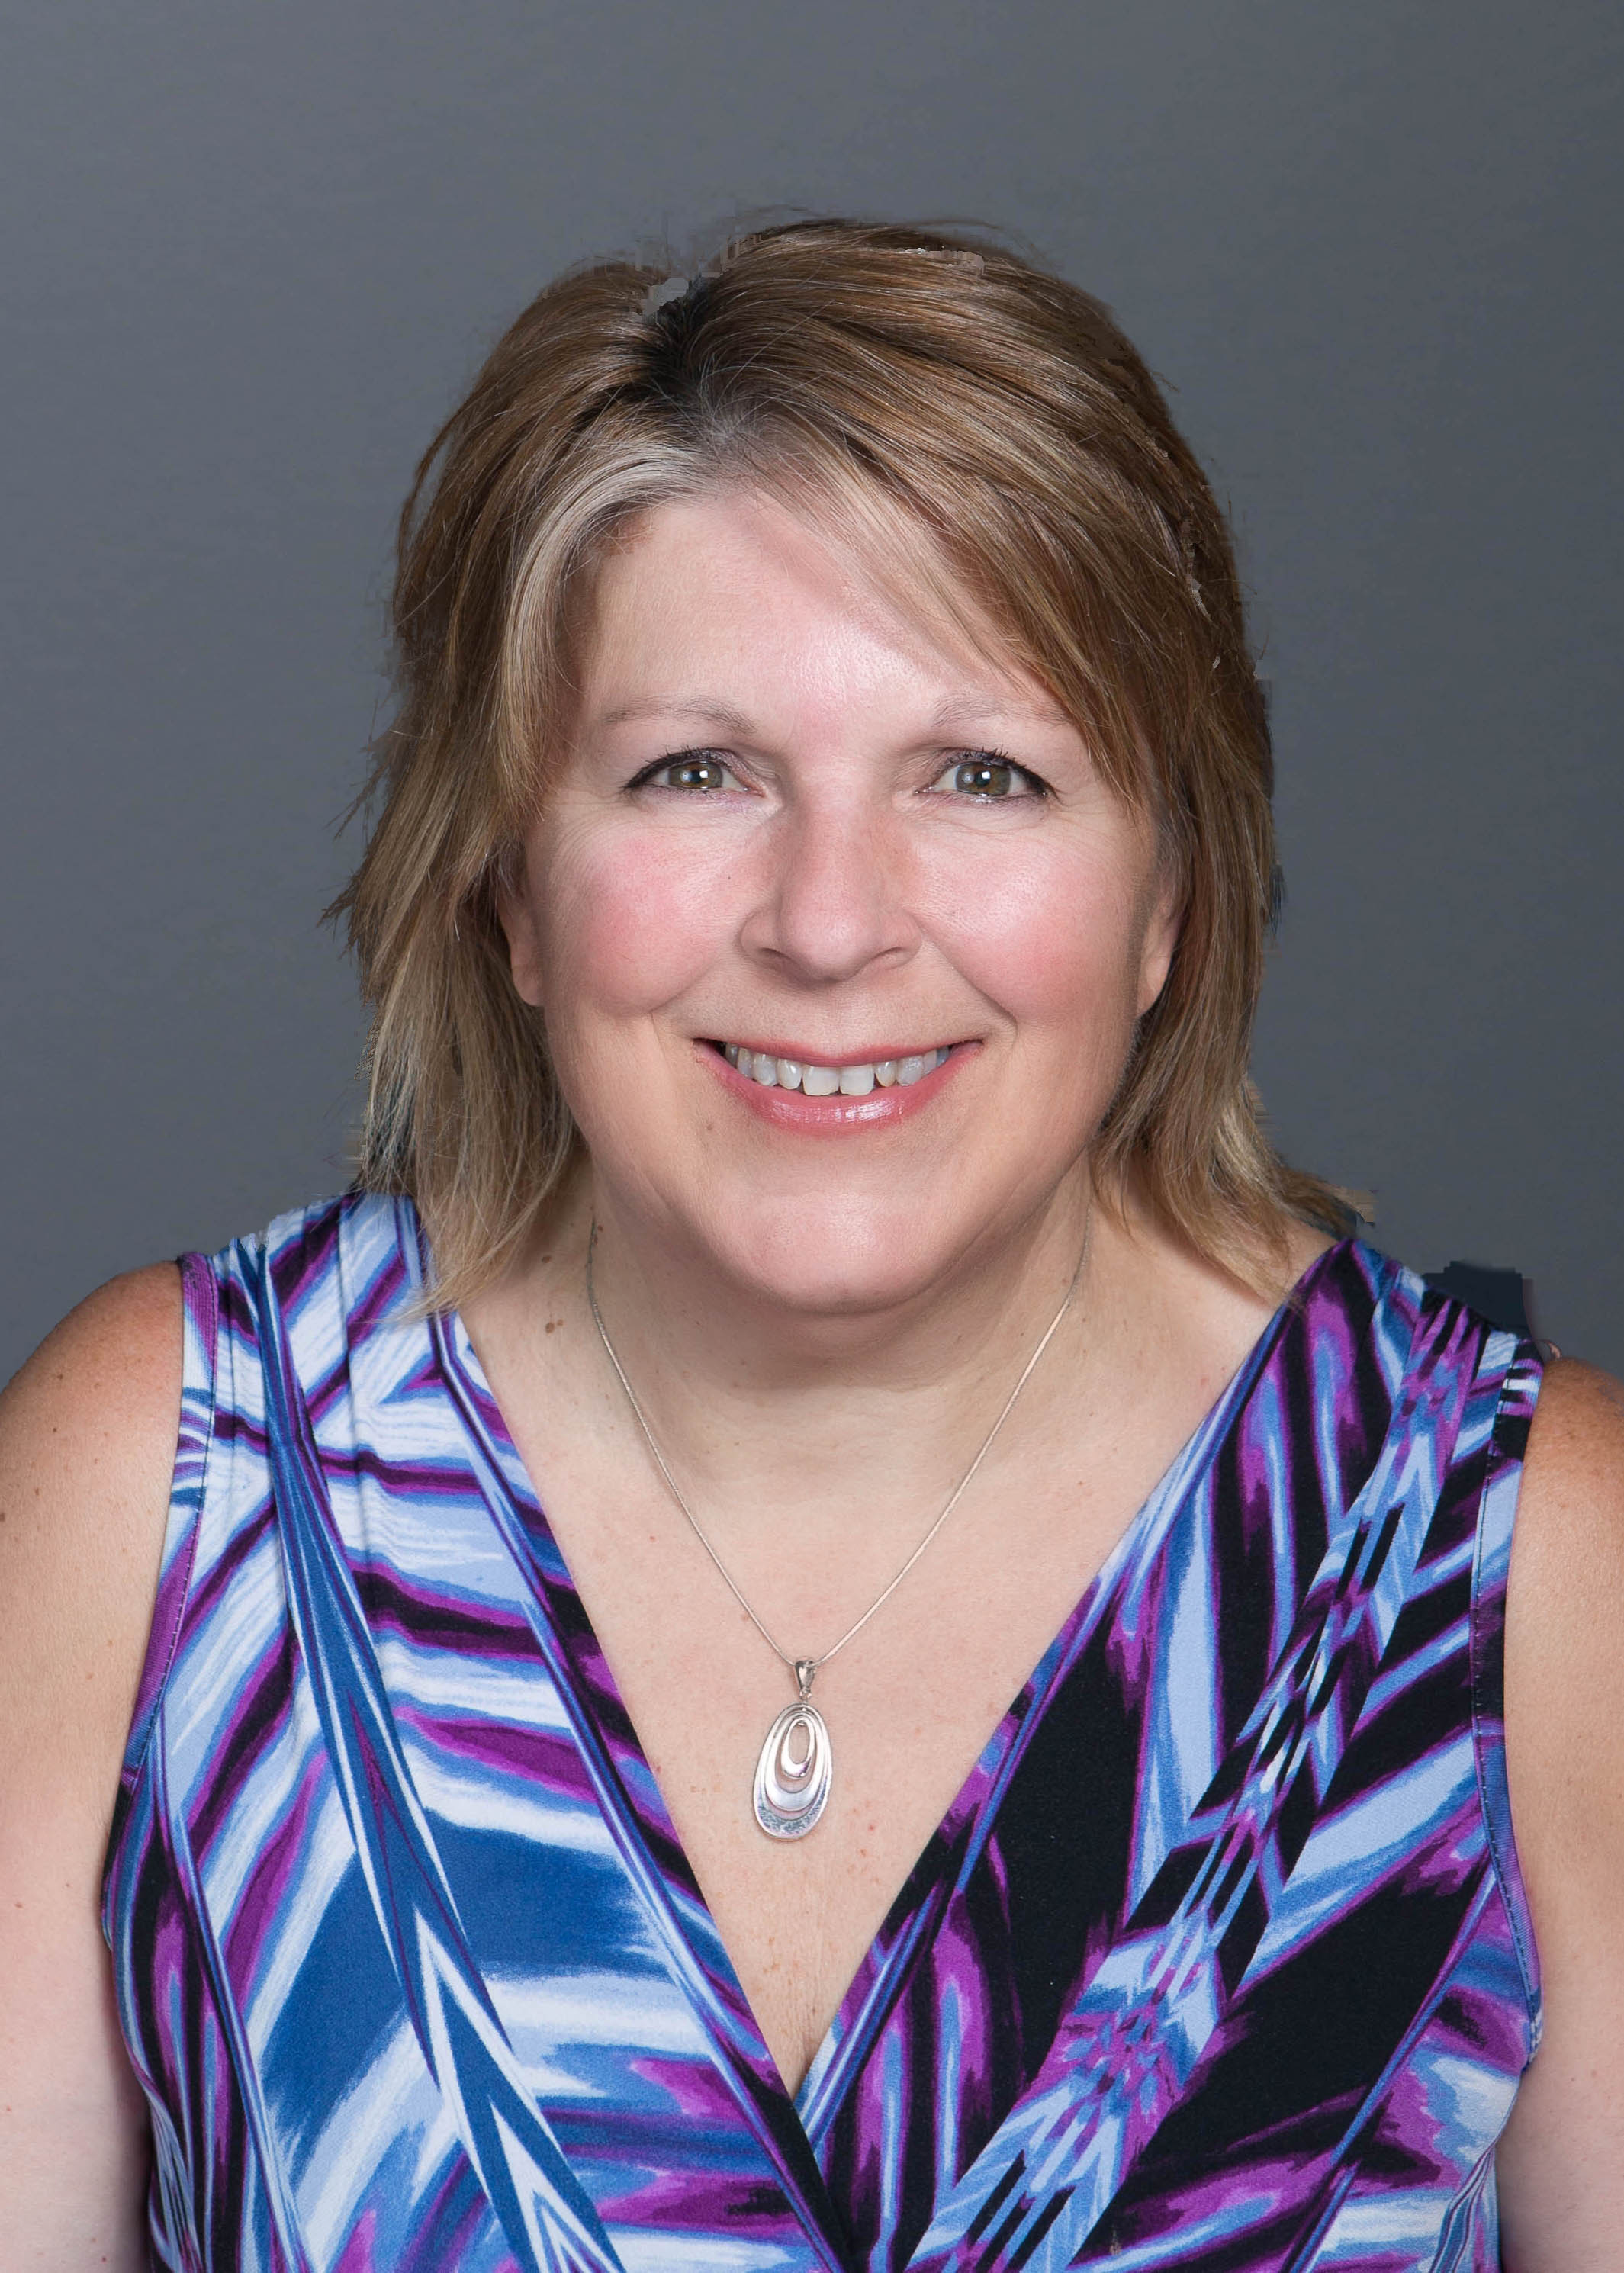 Lori Coleman